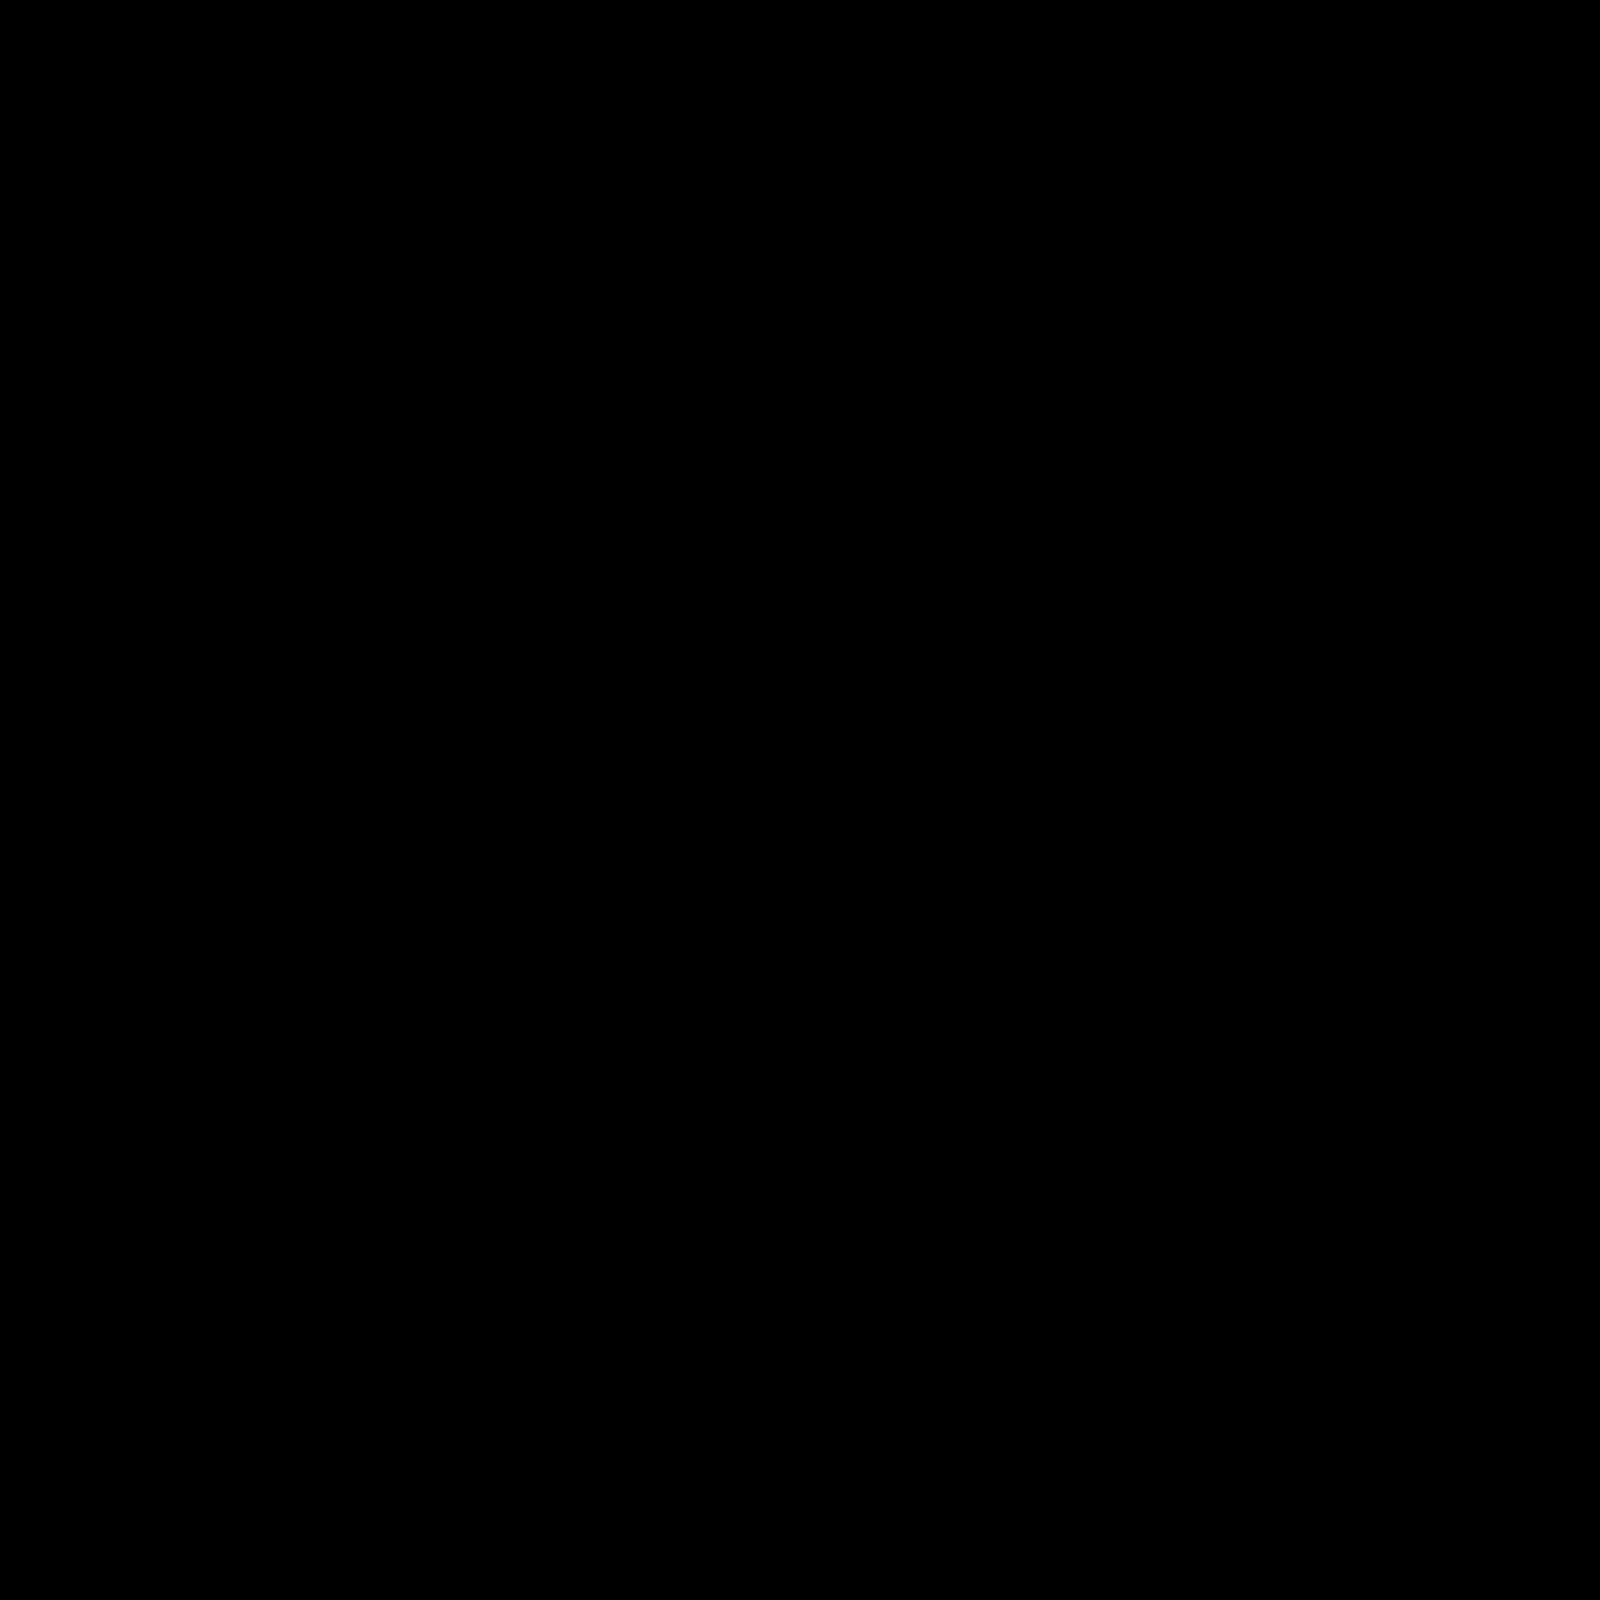 Dół w lewo icon